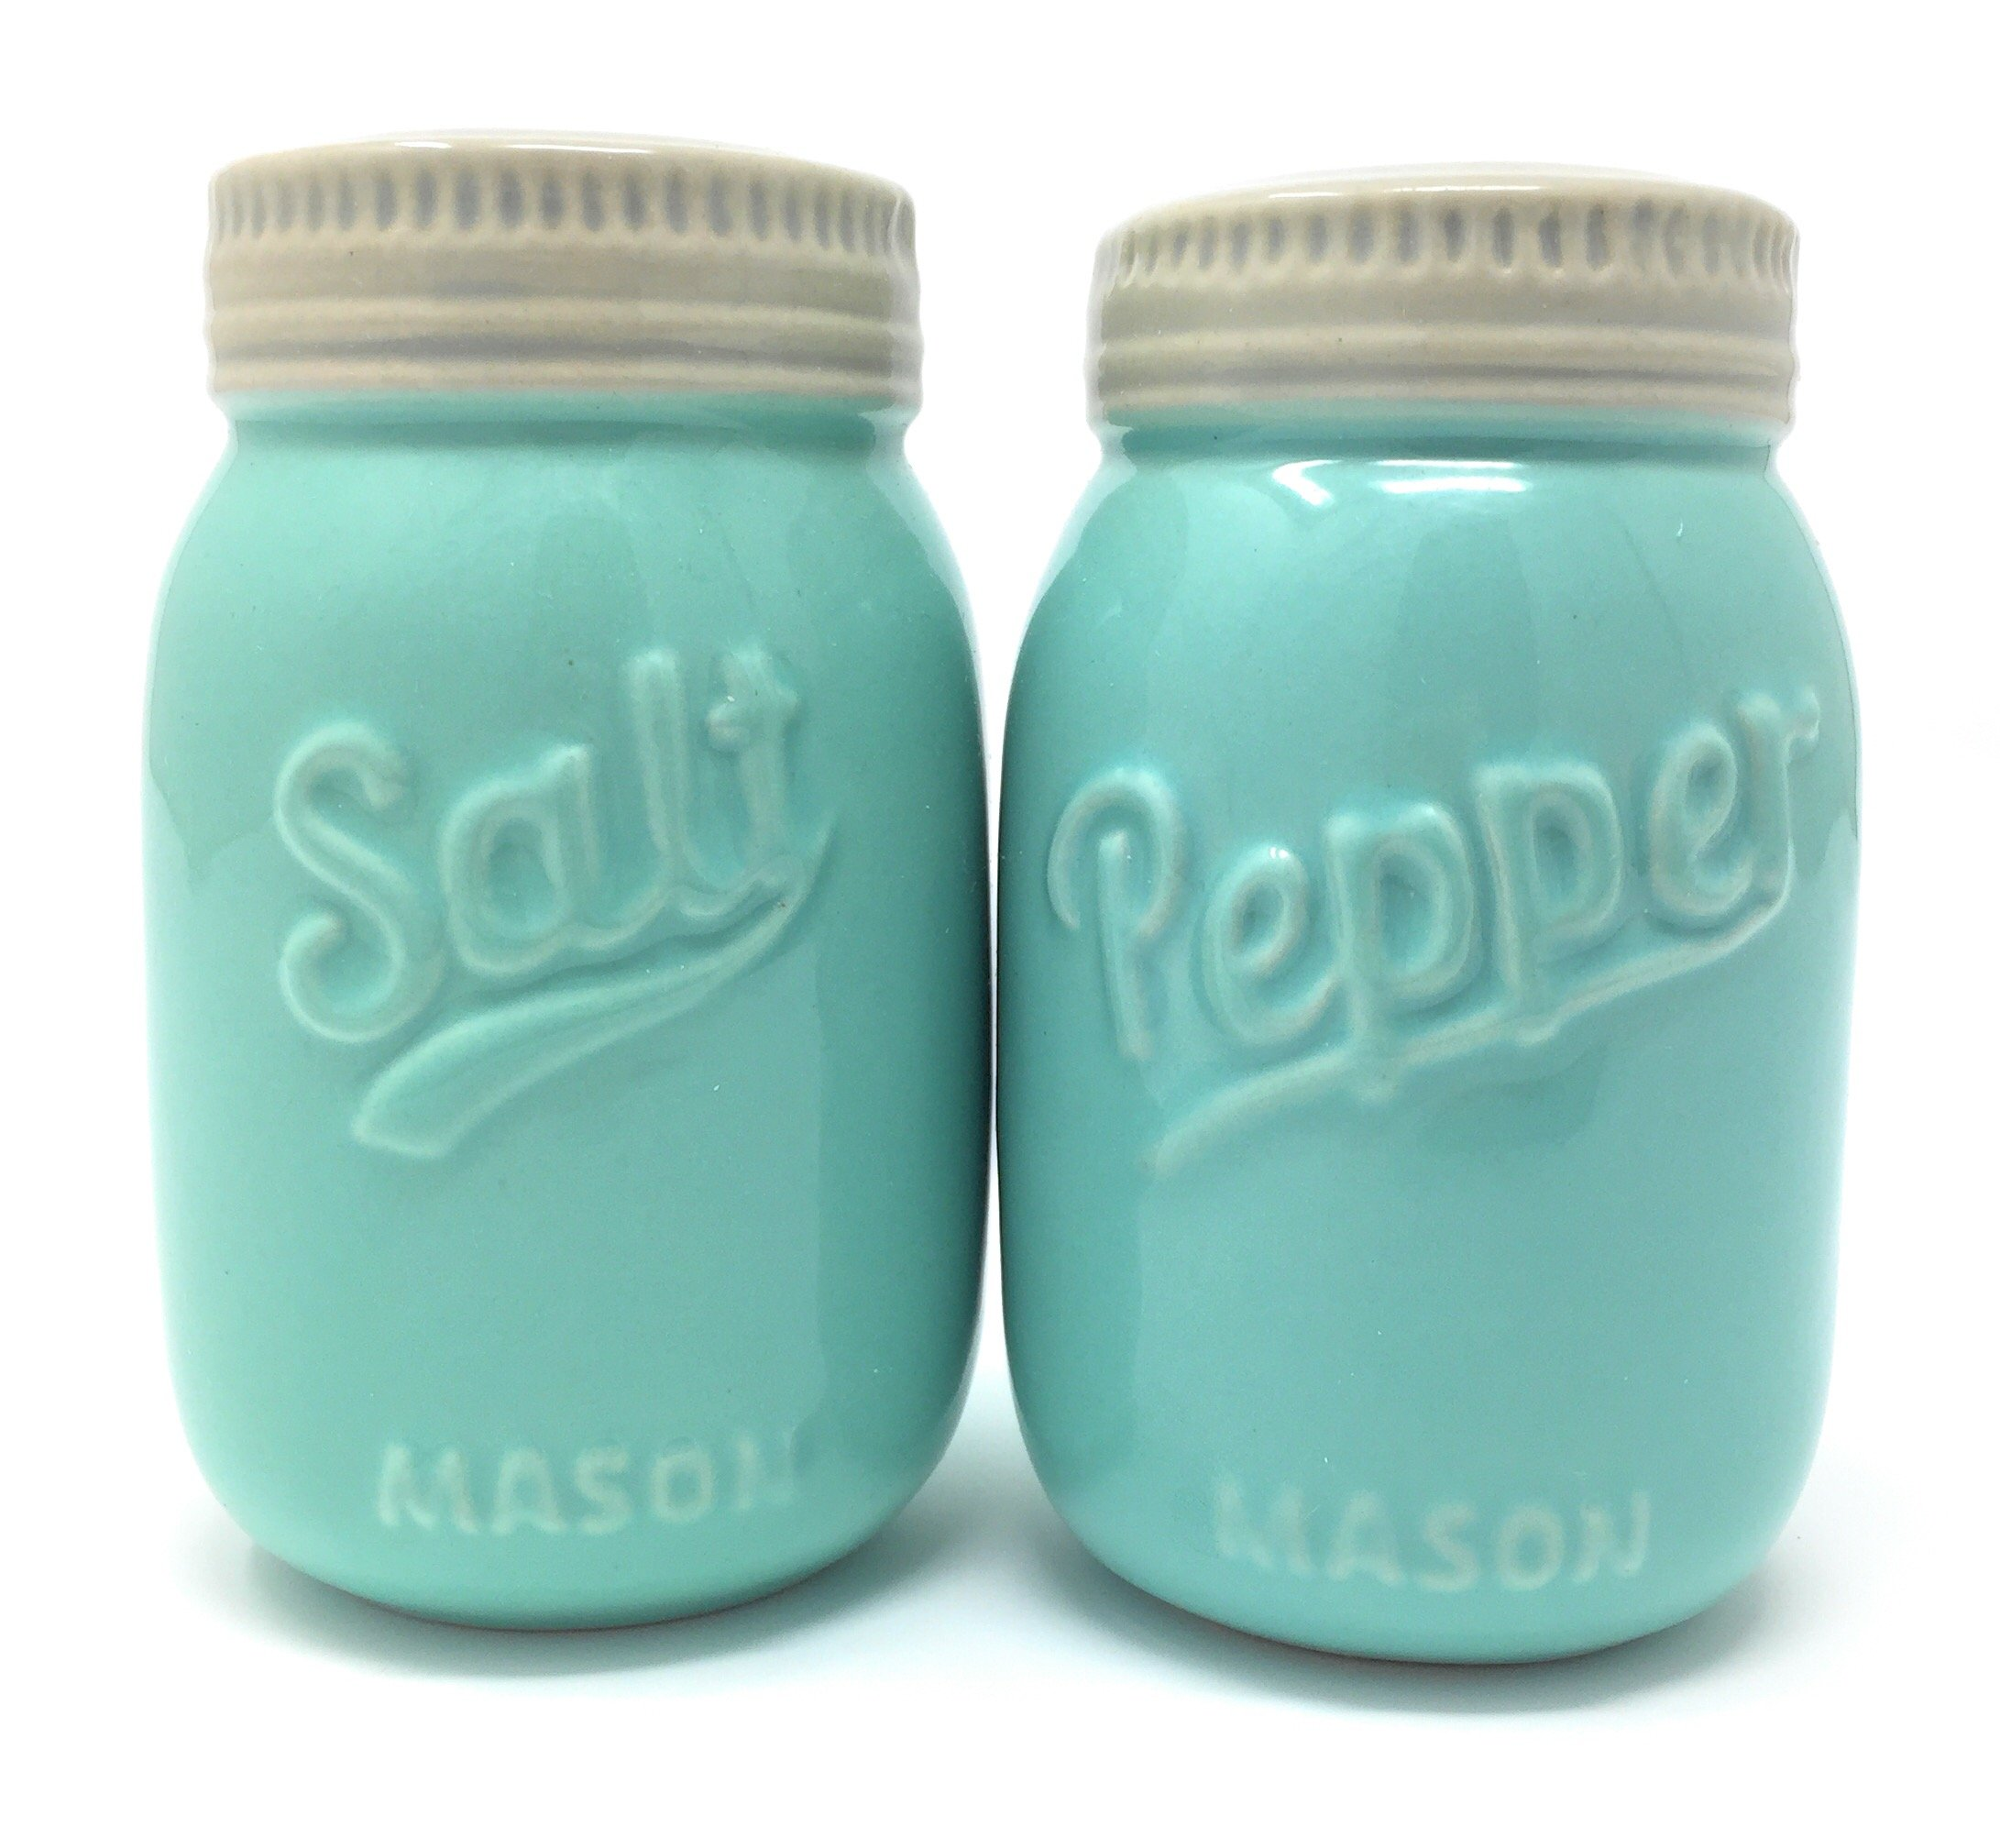 Vintage Mason Jar Salt and Pepper Shakers - Rustic, Farmhouse, Shabby Chic Mason Jar Decor - Mint Blue Sturdy Ceramic Shakers make for Adorable Decorative Farmhouse Kitchen Decor